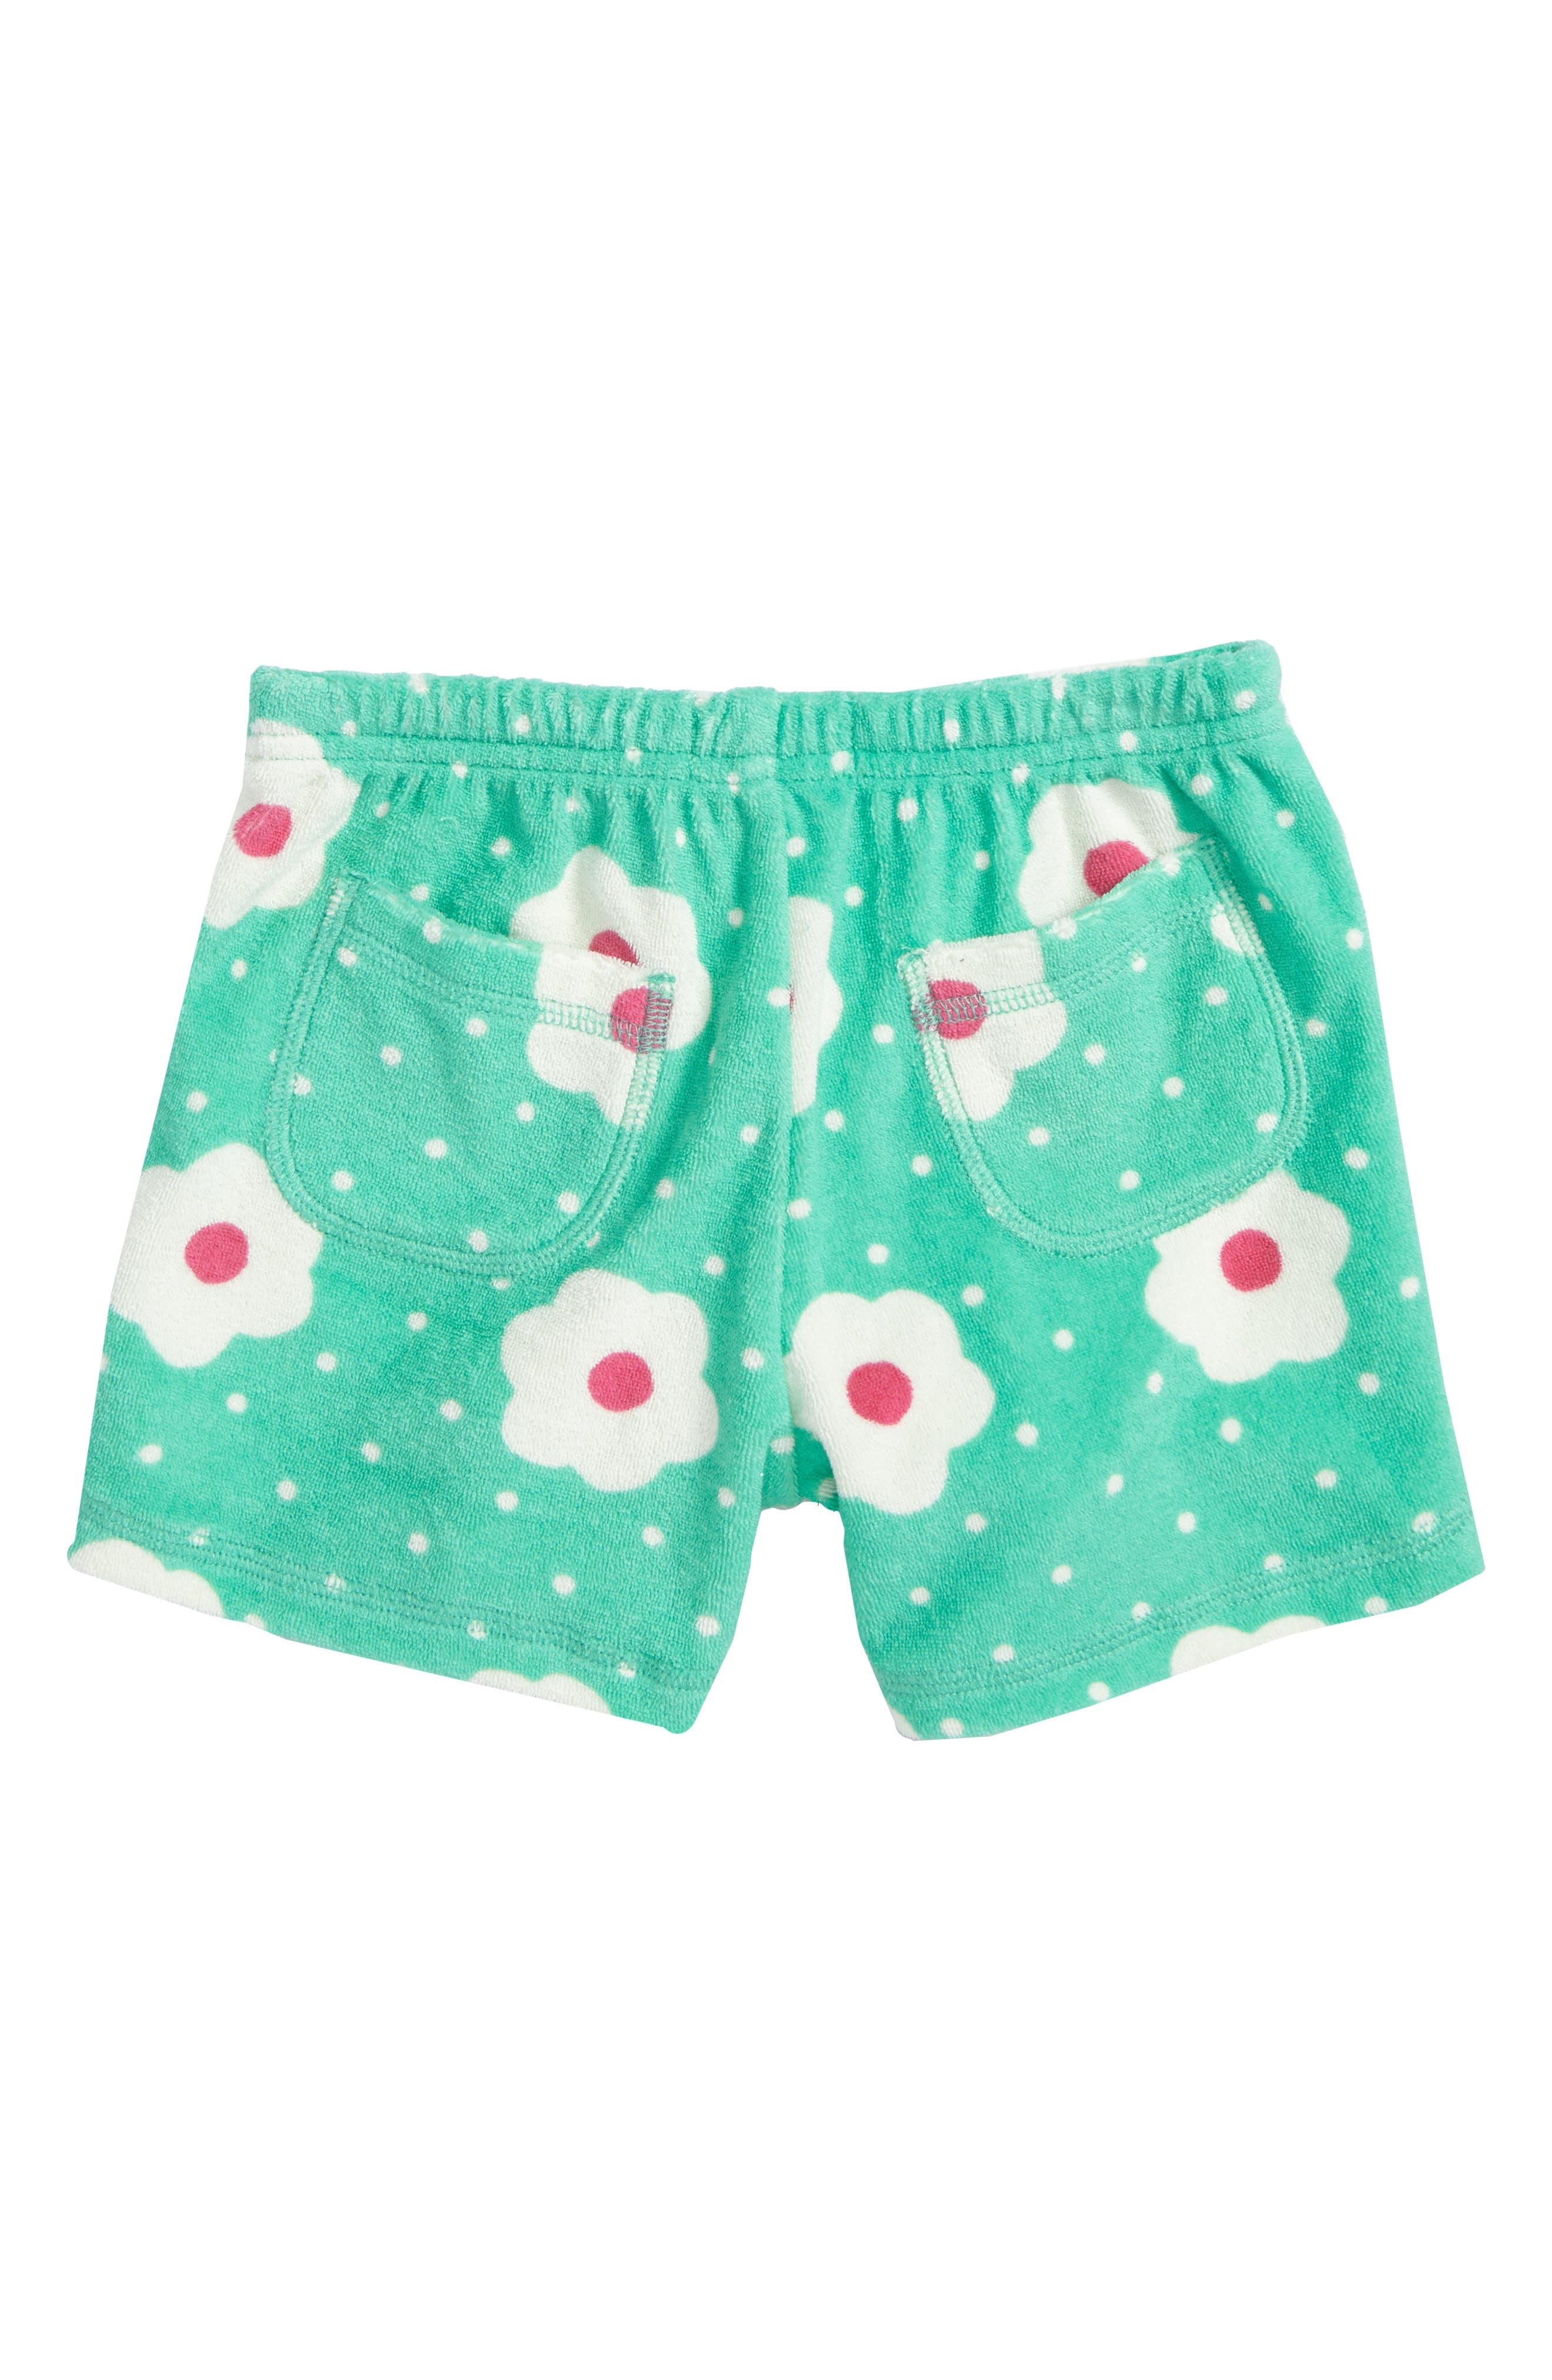 Adventure Toweling Shorts,                             Alternate thumbnail 2, color,                             315